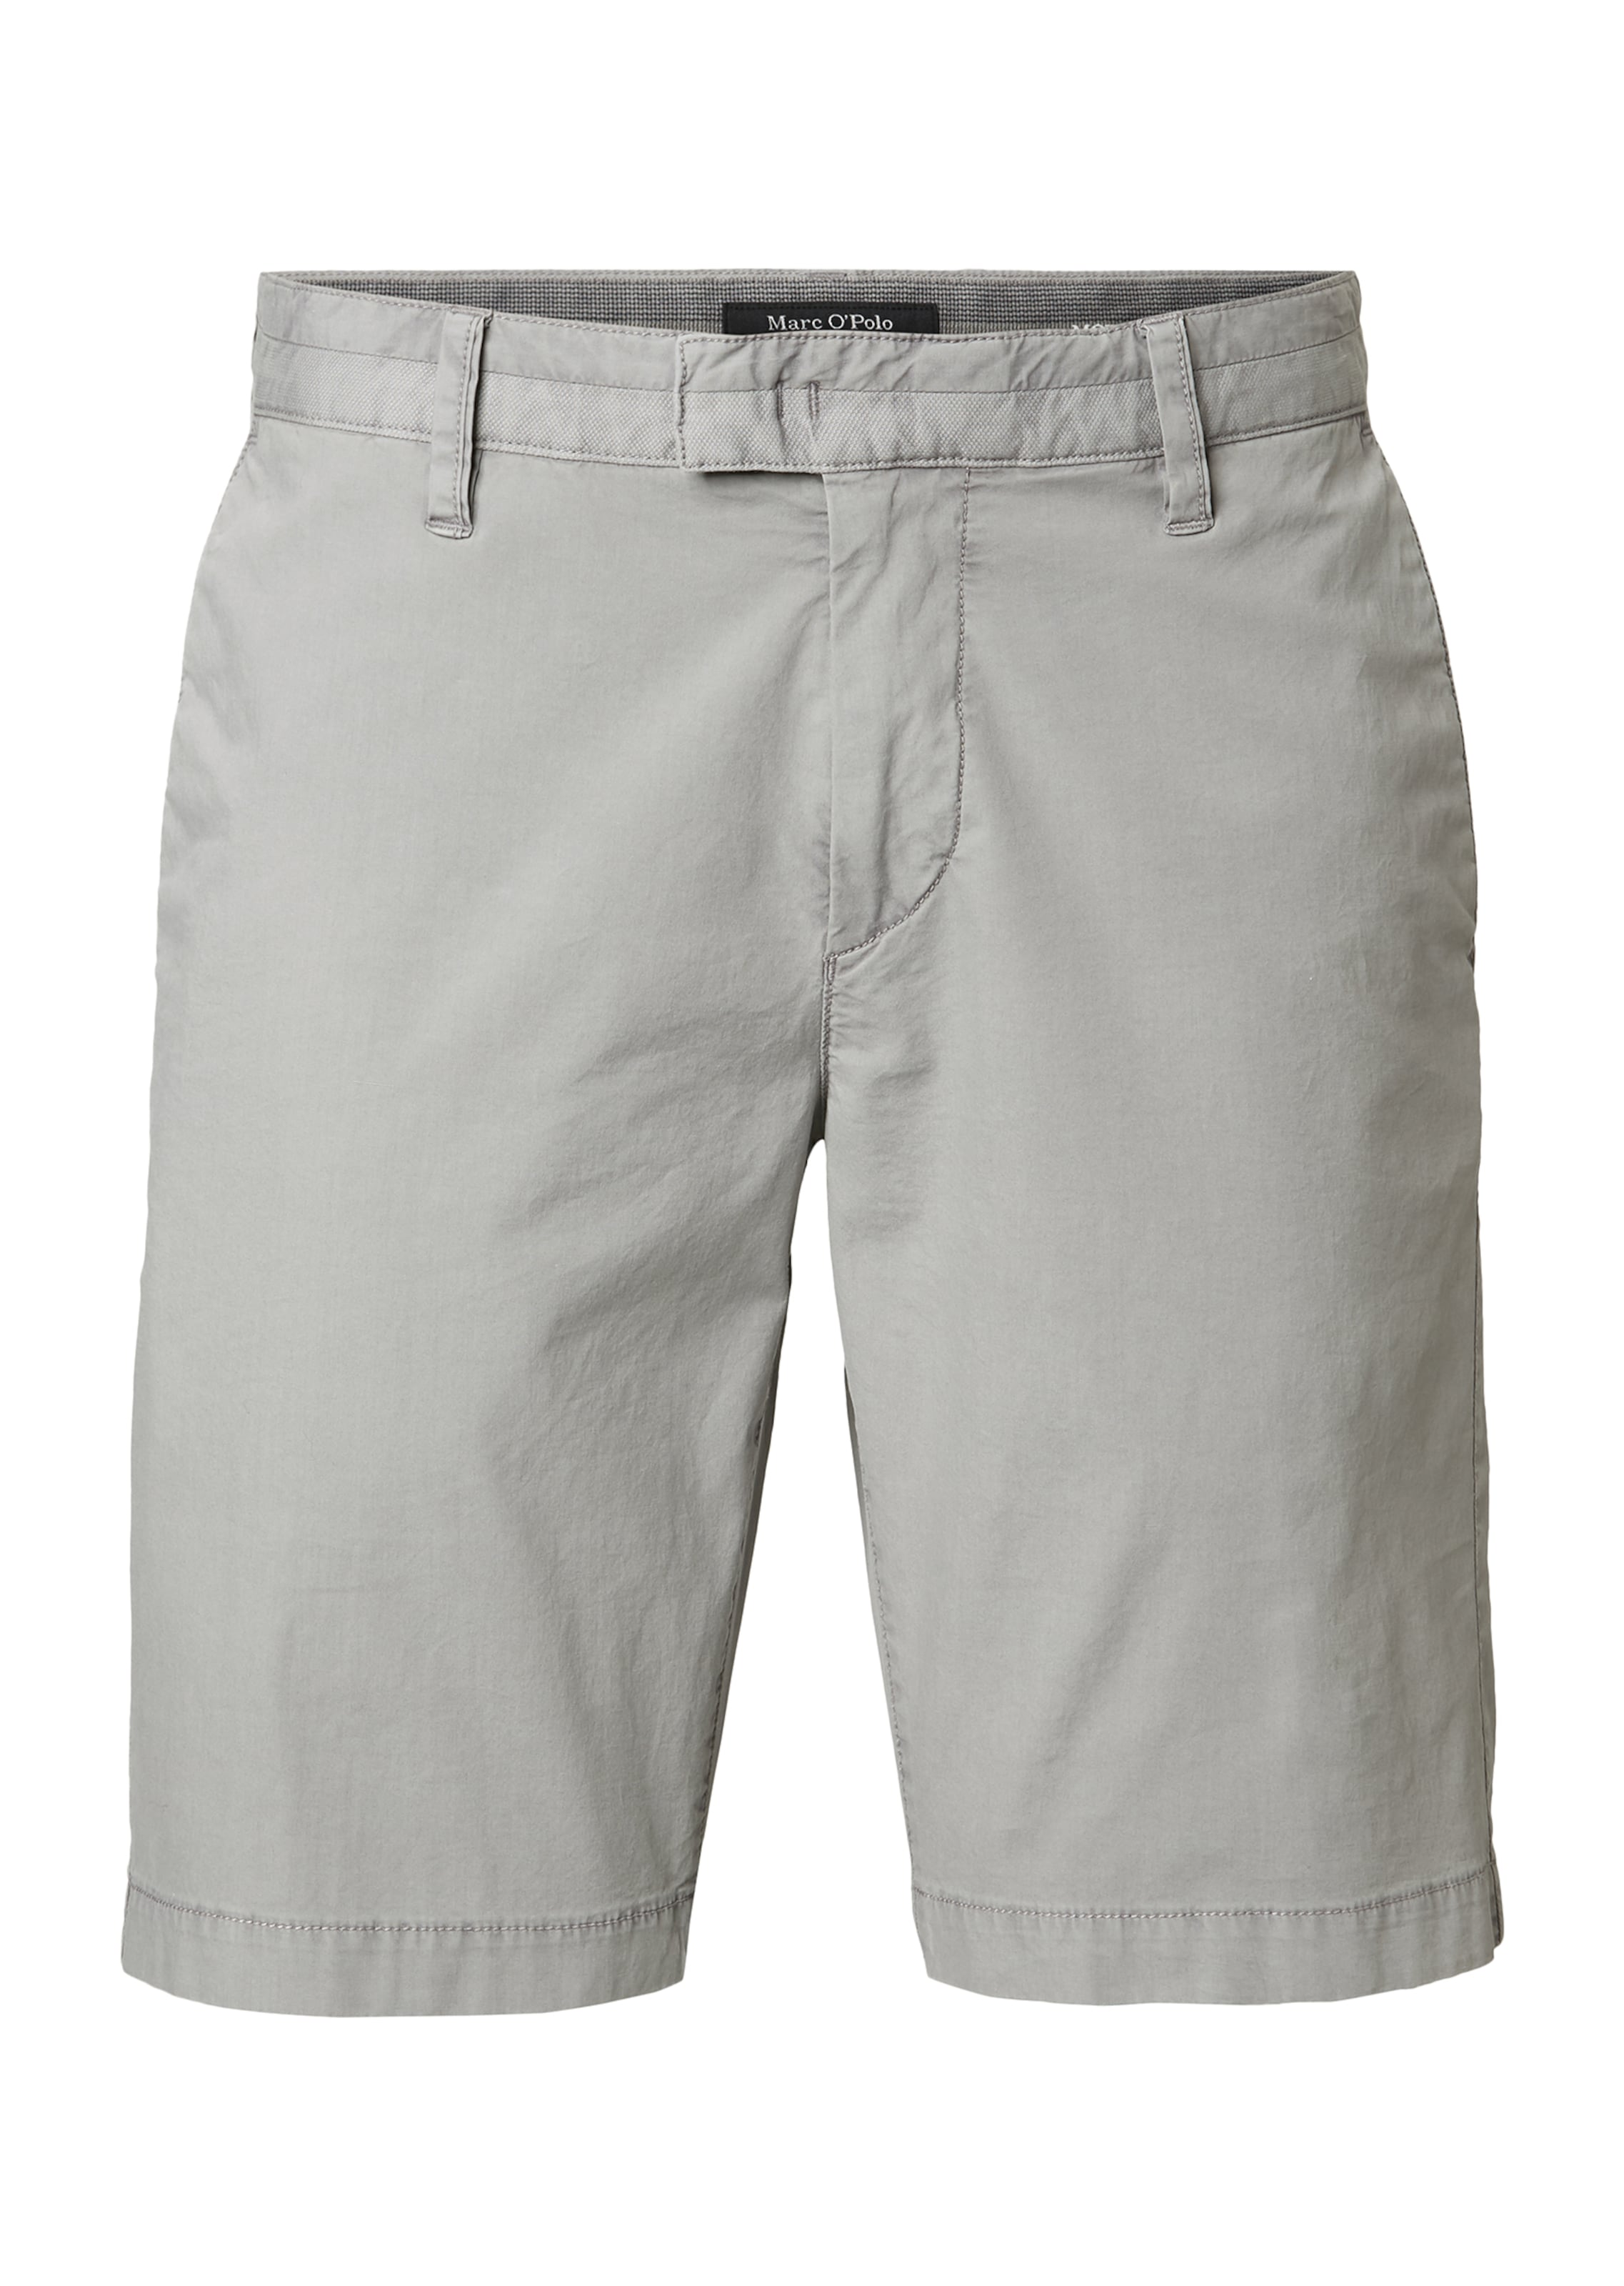 O'polo Marc 'salo' In Hellgrau Shorts Chino Qhdtsr